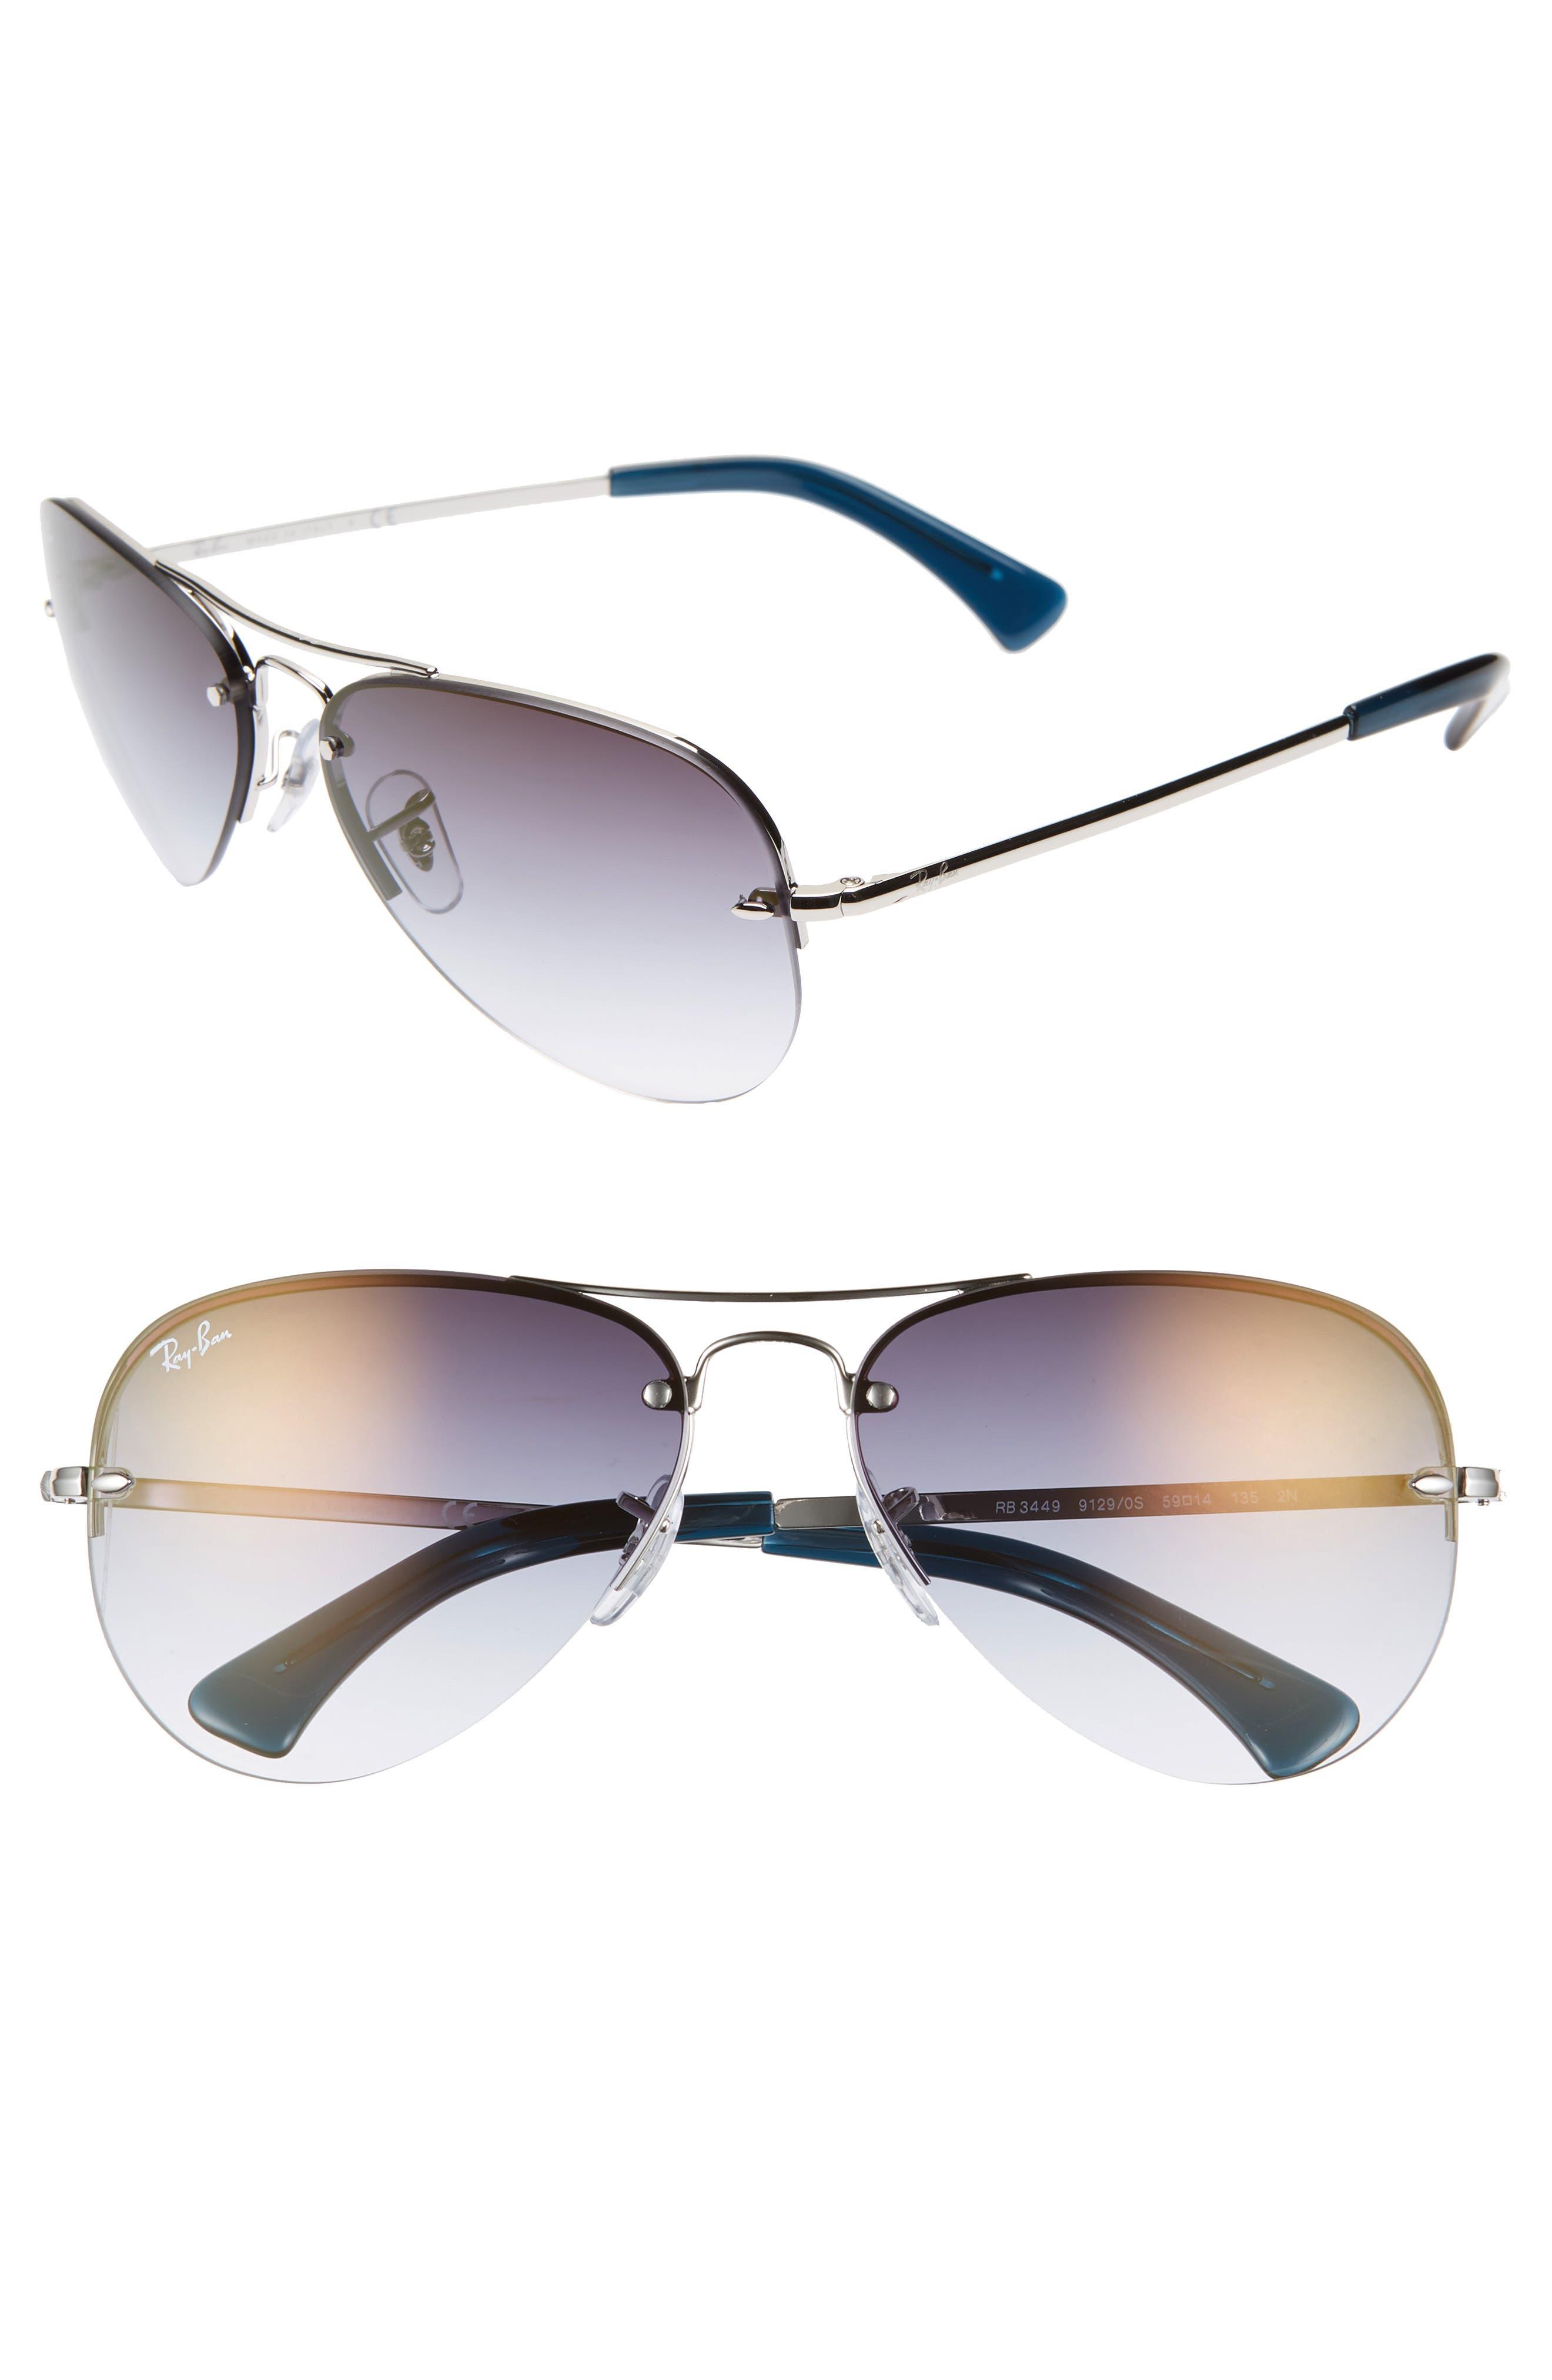 74307fb6cc1 Ray-Ban Sunglasses for Women